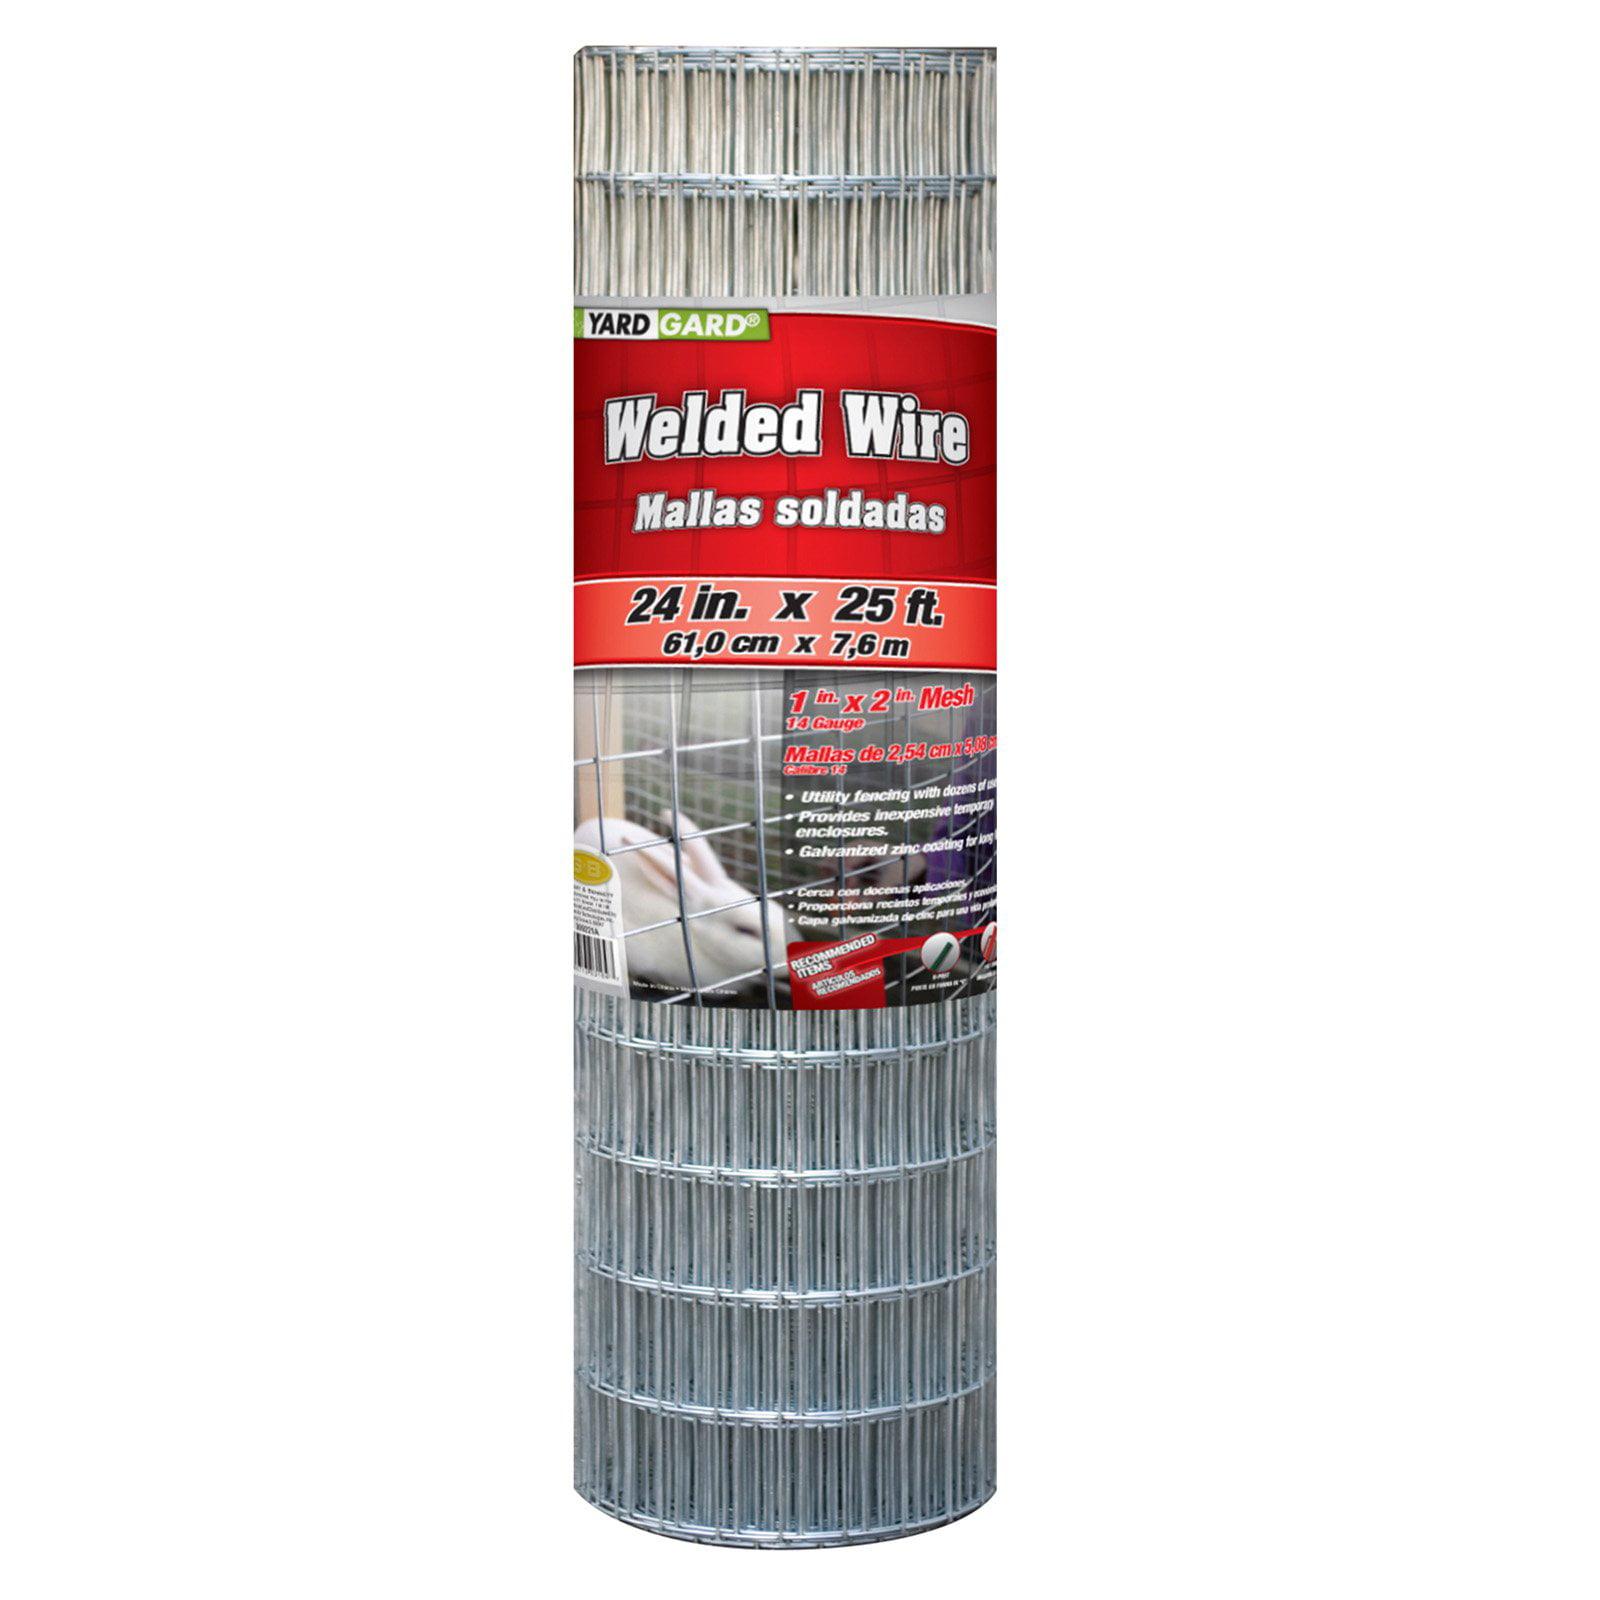 YARDGARD 36 Inch by 50 Foot Galvanized Welded Wire Fence - Walmart.com